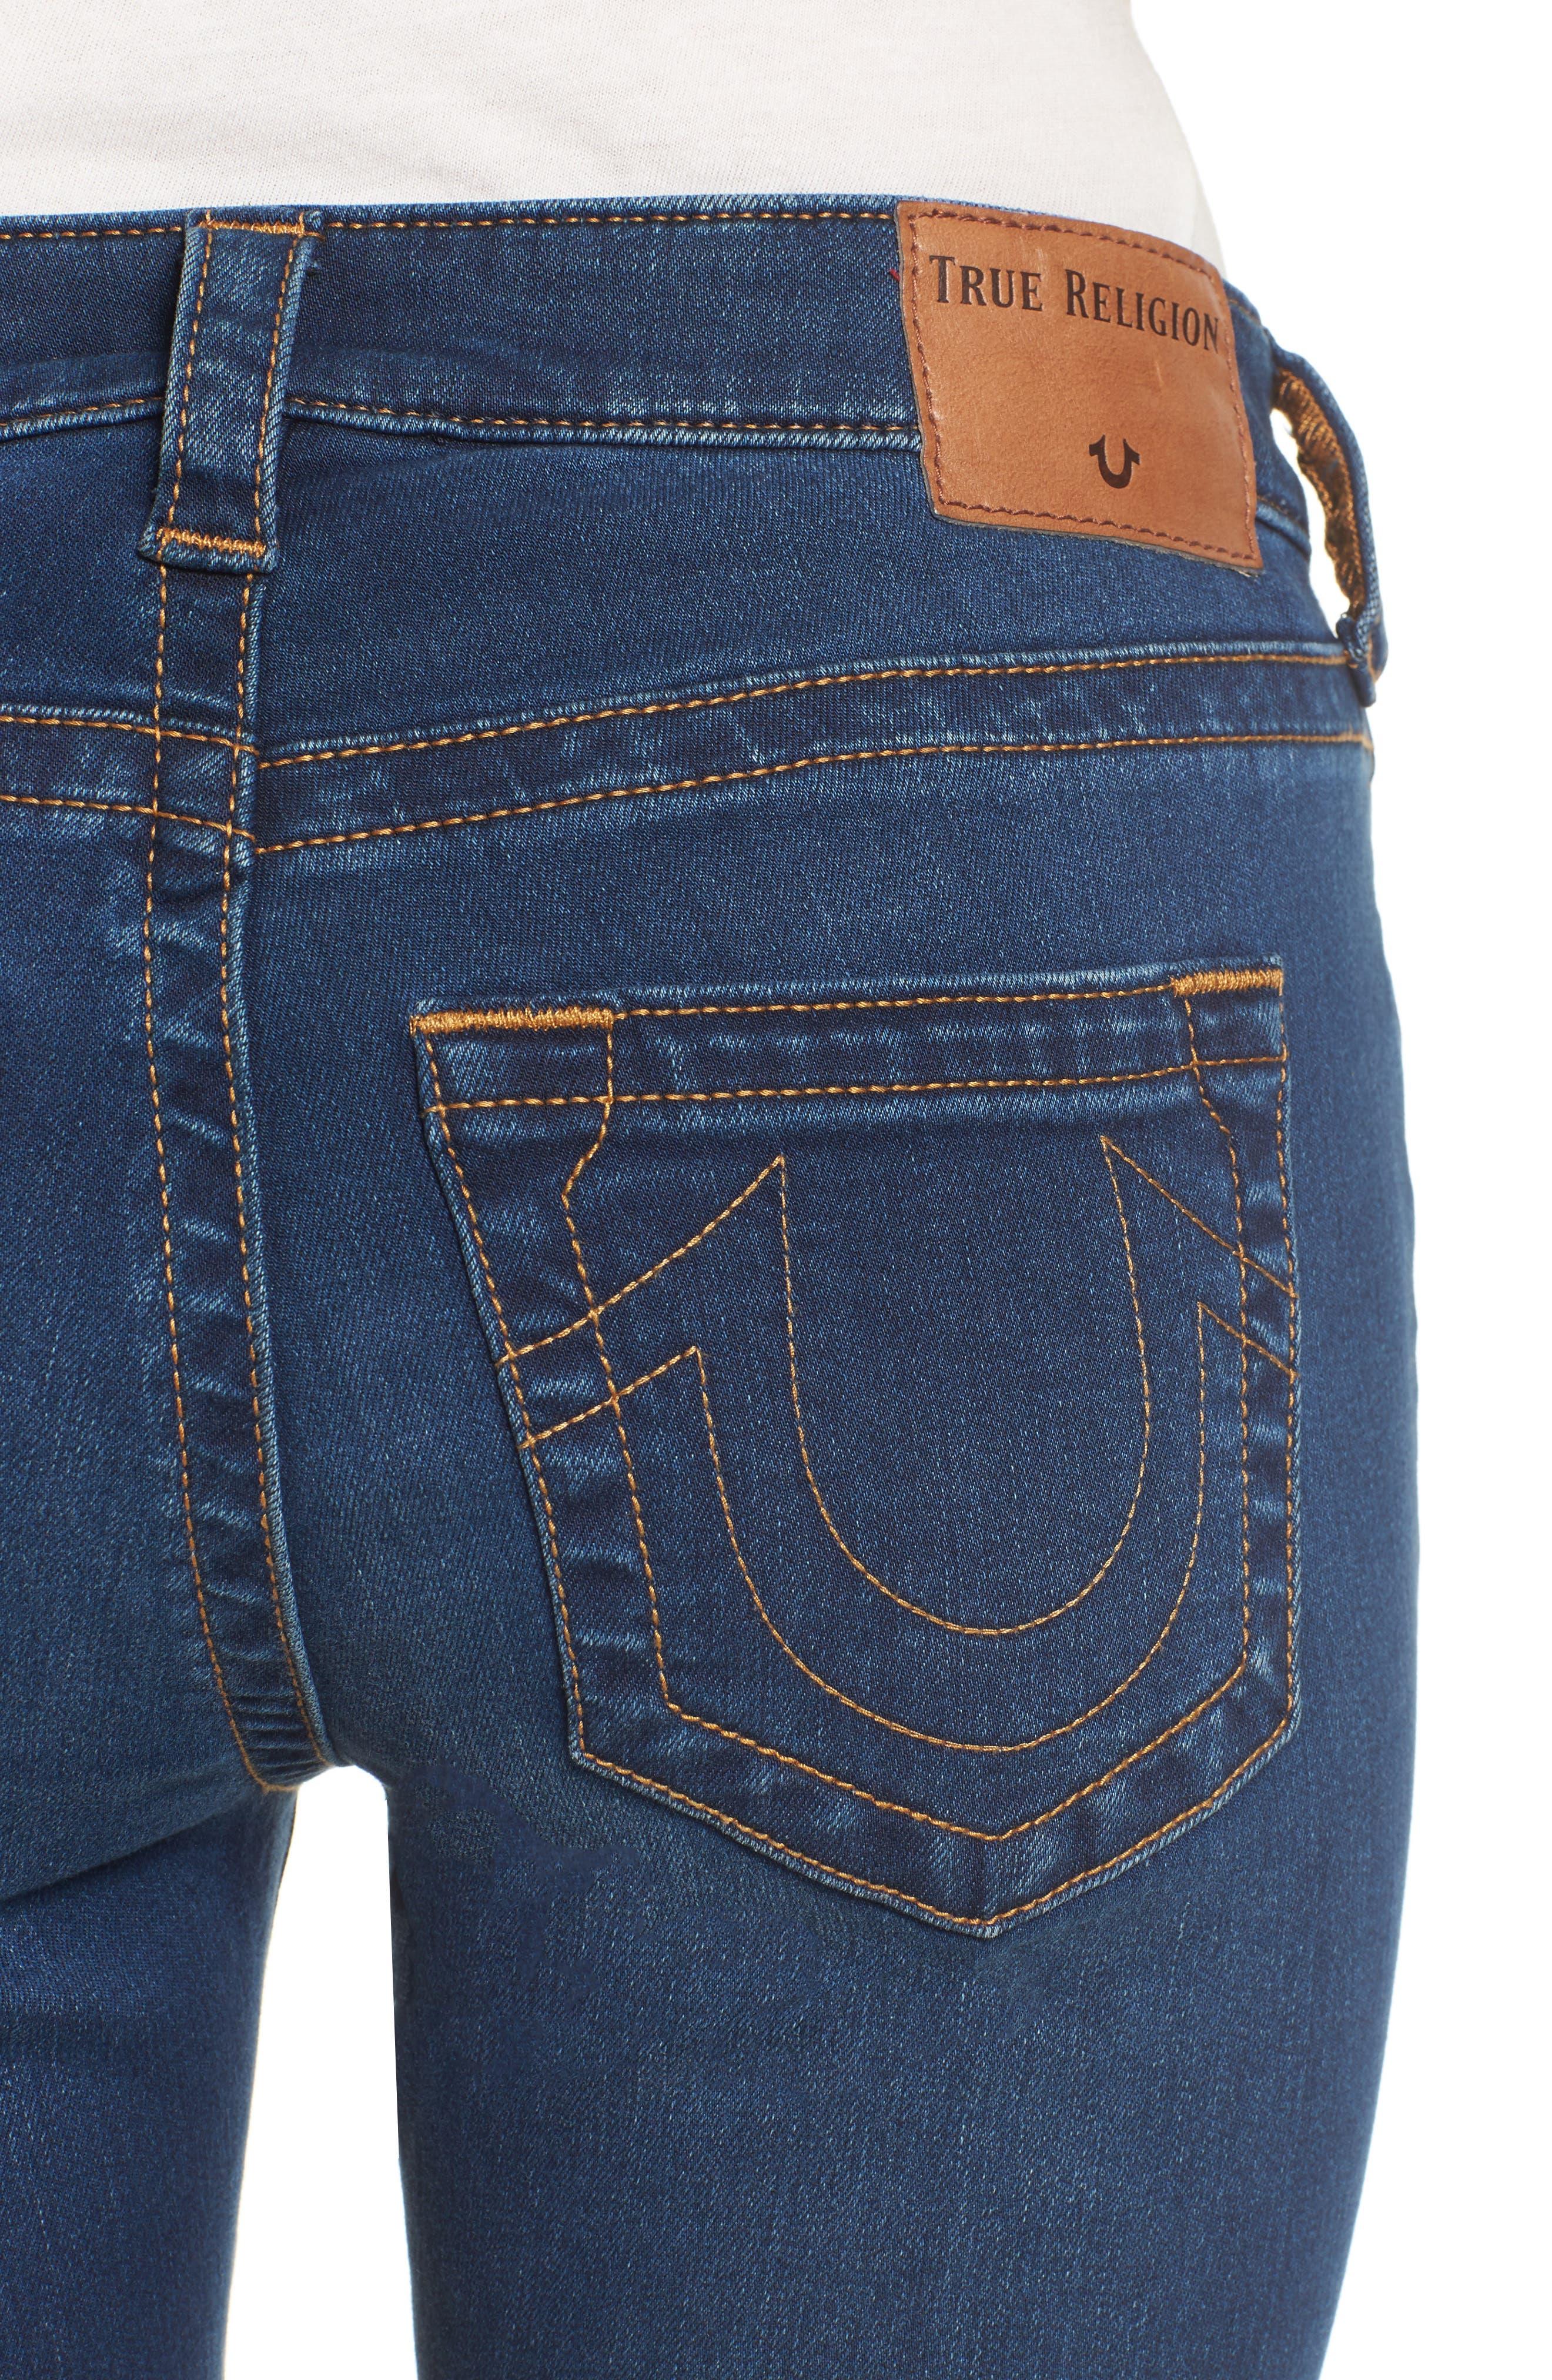 Jennie Curvy Skinny Jeans,                             Alternate thumbnail 4, color,                             Lands End Indigo